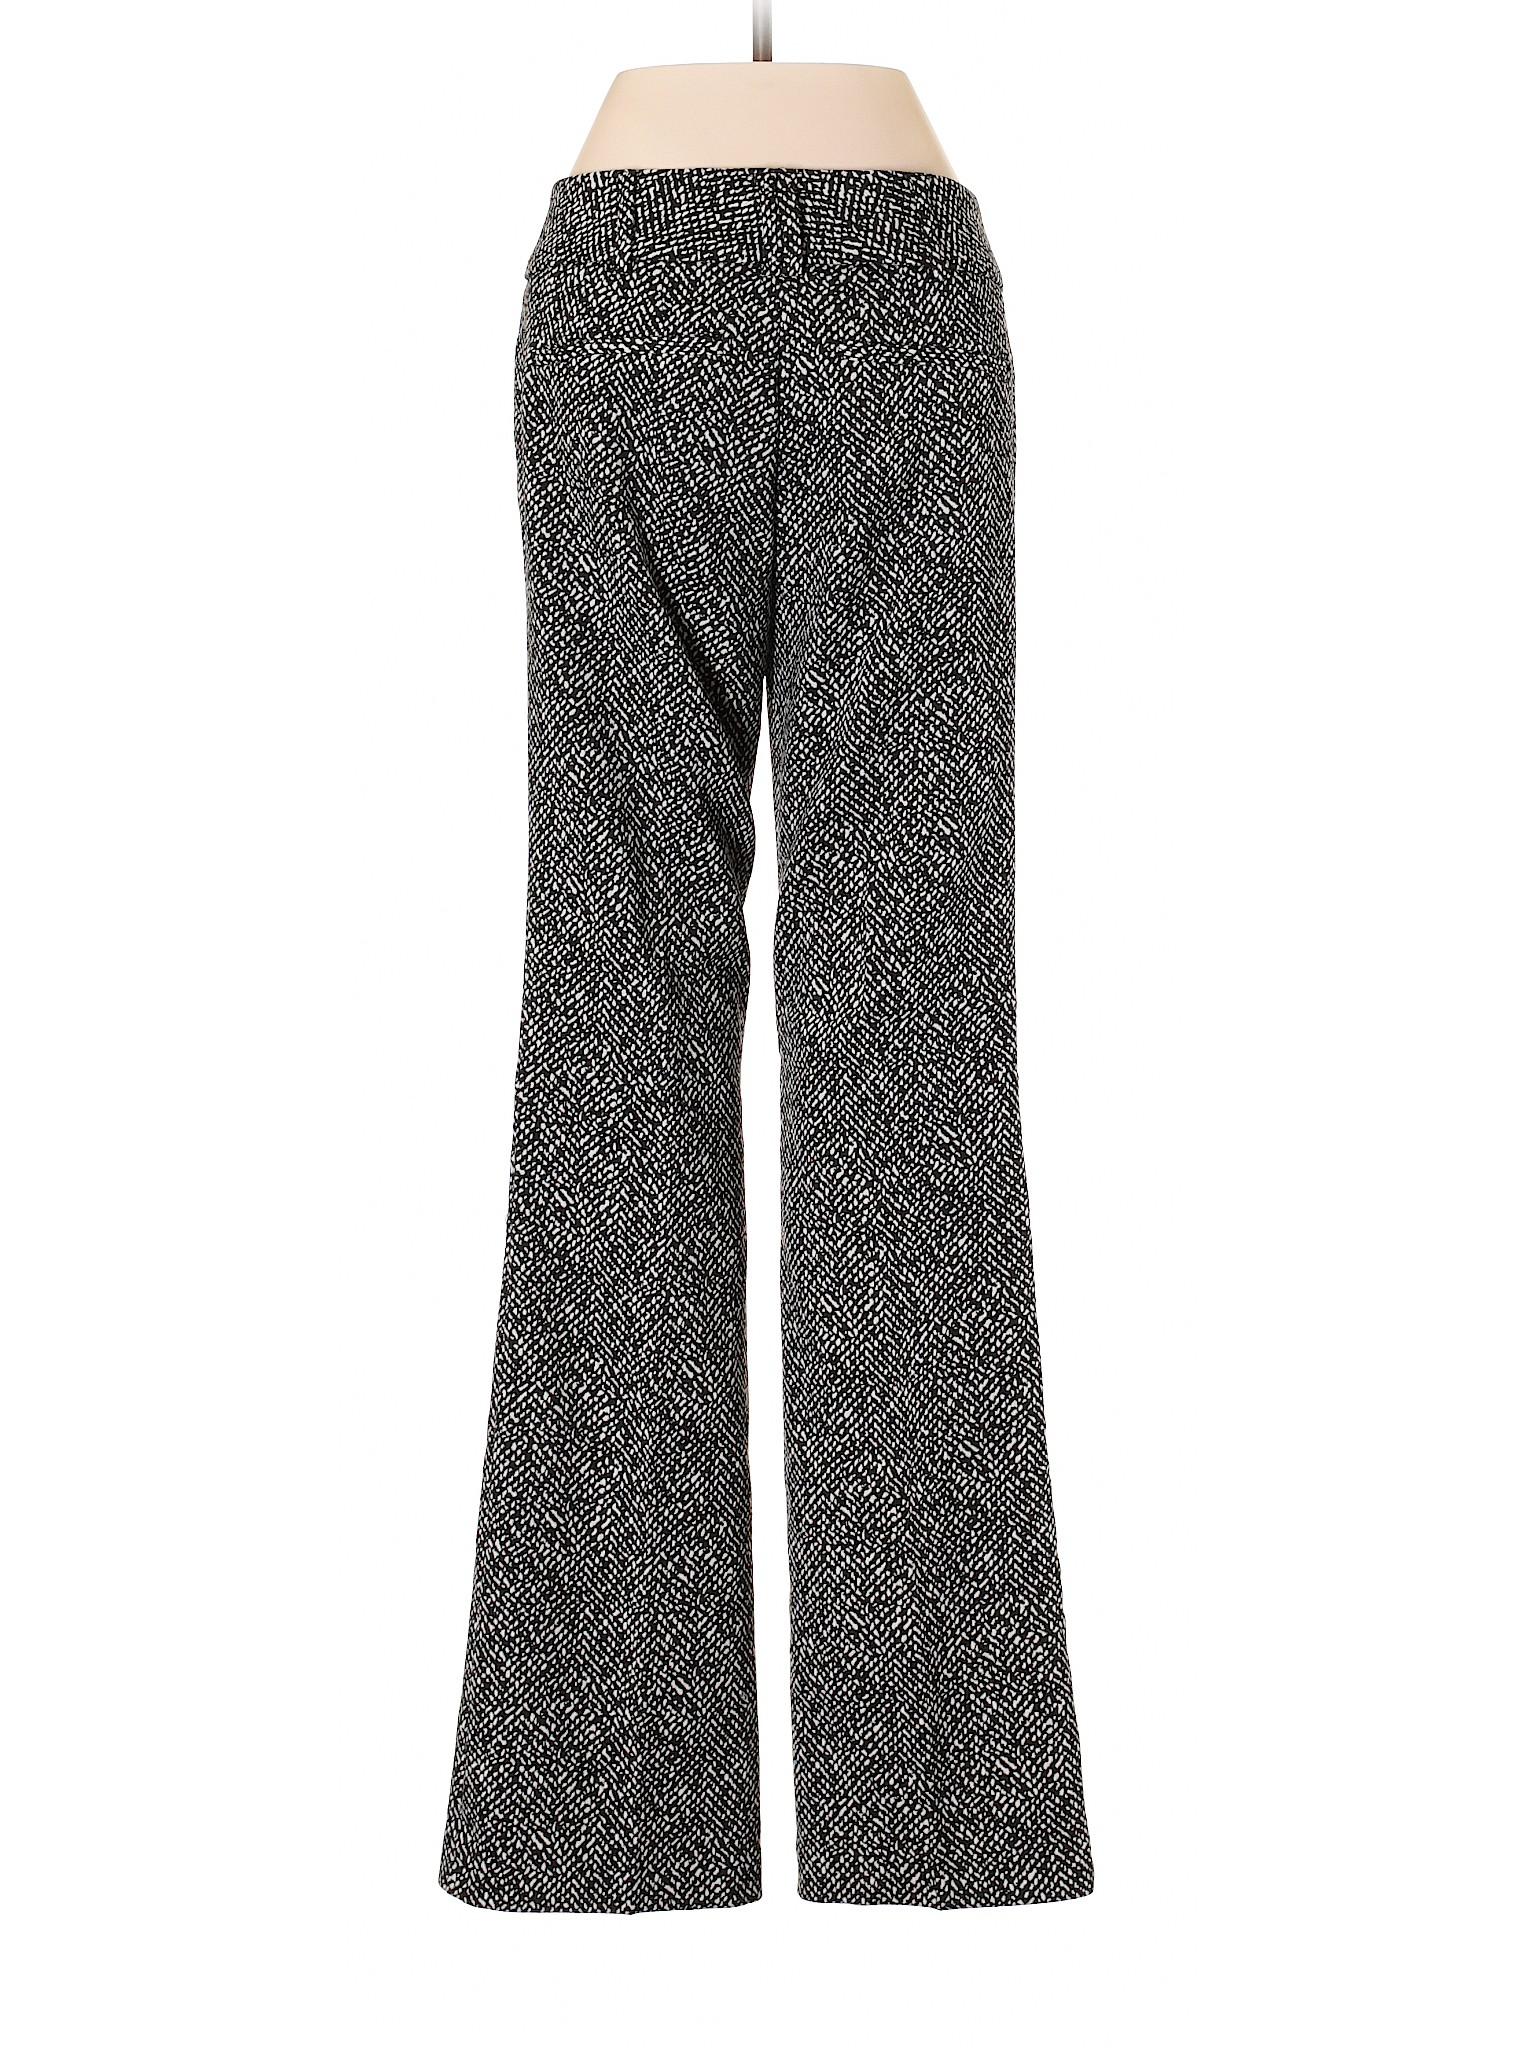 Studio Design Casual amp; Avenue Company York 7th New leisure Pants Boutique tqBI4B